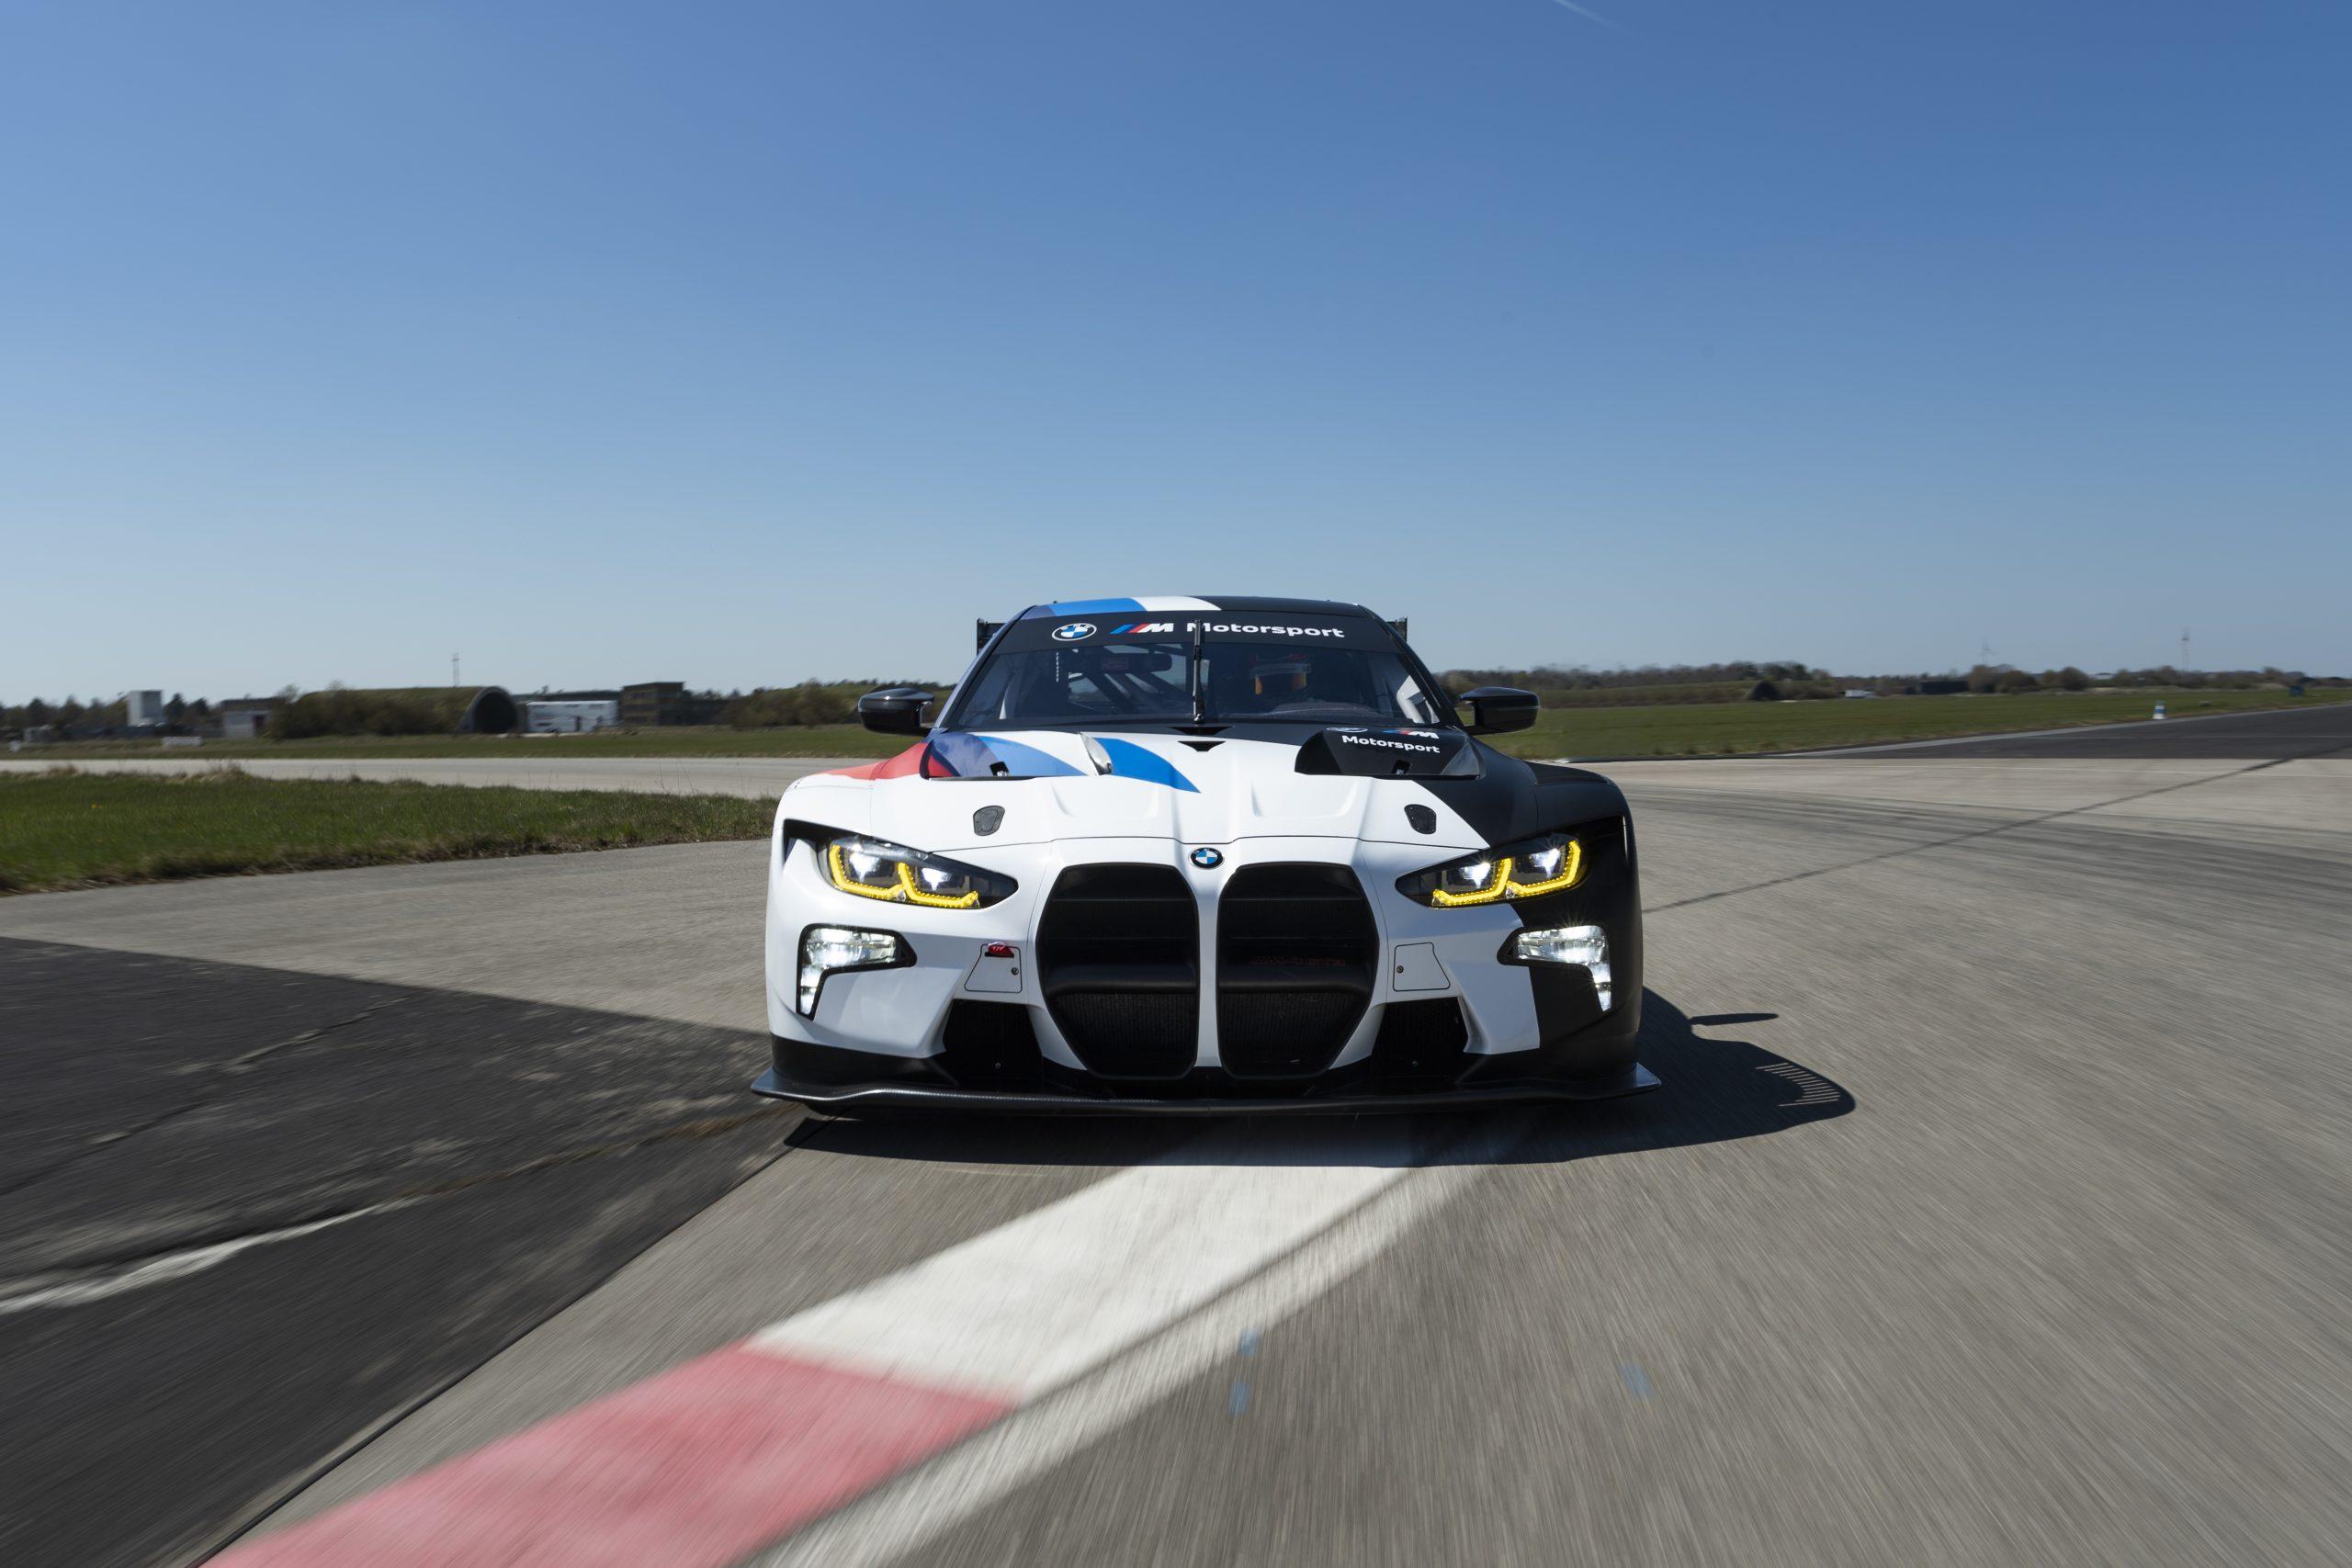 P90424809 highRes scaled Πρεμιέρα για την BMW M4 GT3 στην Eau Rouge BMW, BMW M, BMW M4, BMW M4 GT3, BMW Motorsport, M4 GT3, αγωνες, αγωνιστικά, ειδήσεις, Νέα